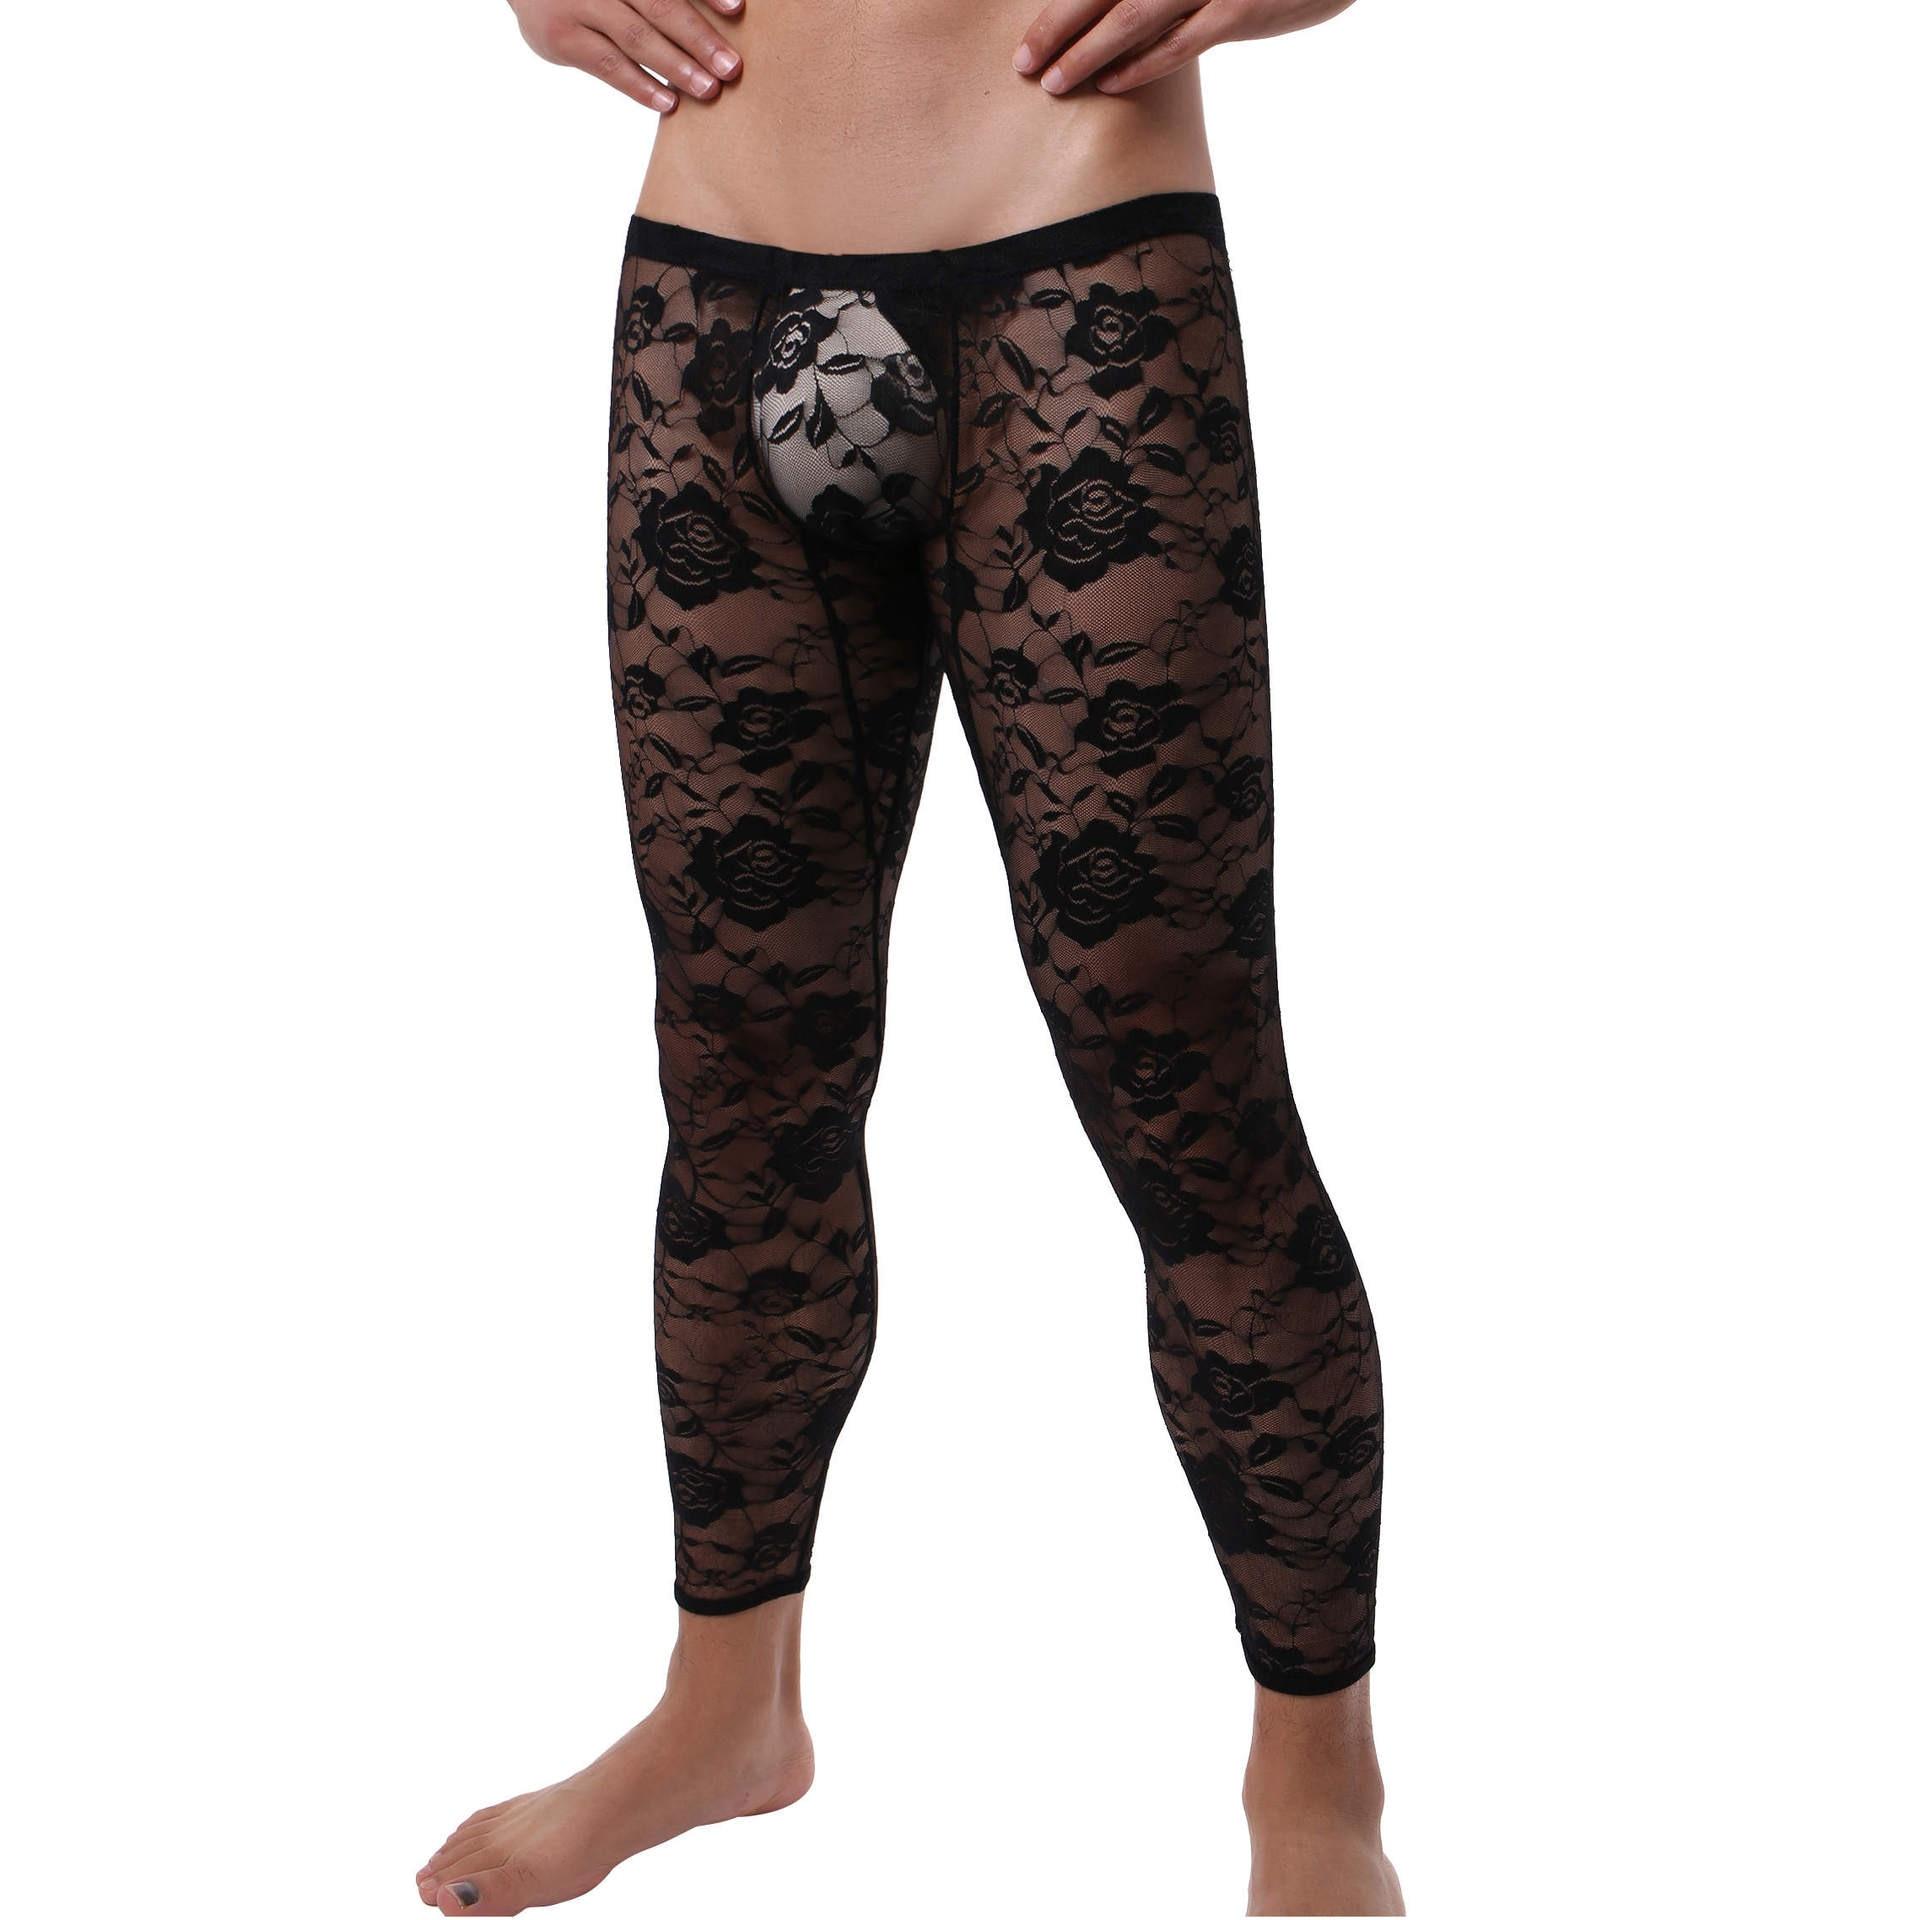 Pantalones largos sexis de encaje transparente estampado Sexy ropa interior Gay para hombre Legging ajustado largo calzoncillos ajustados para montar Fitness